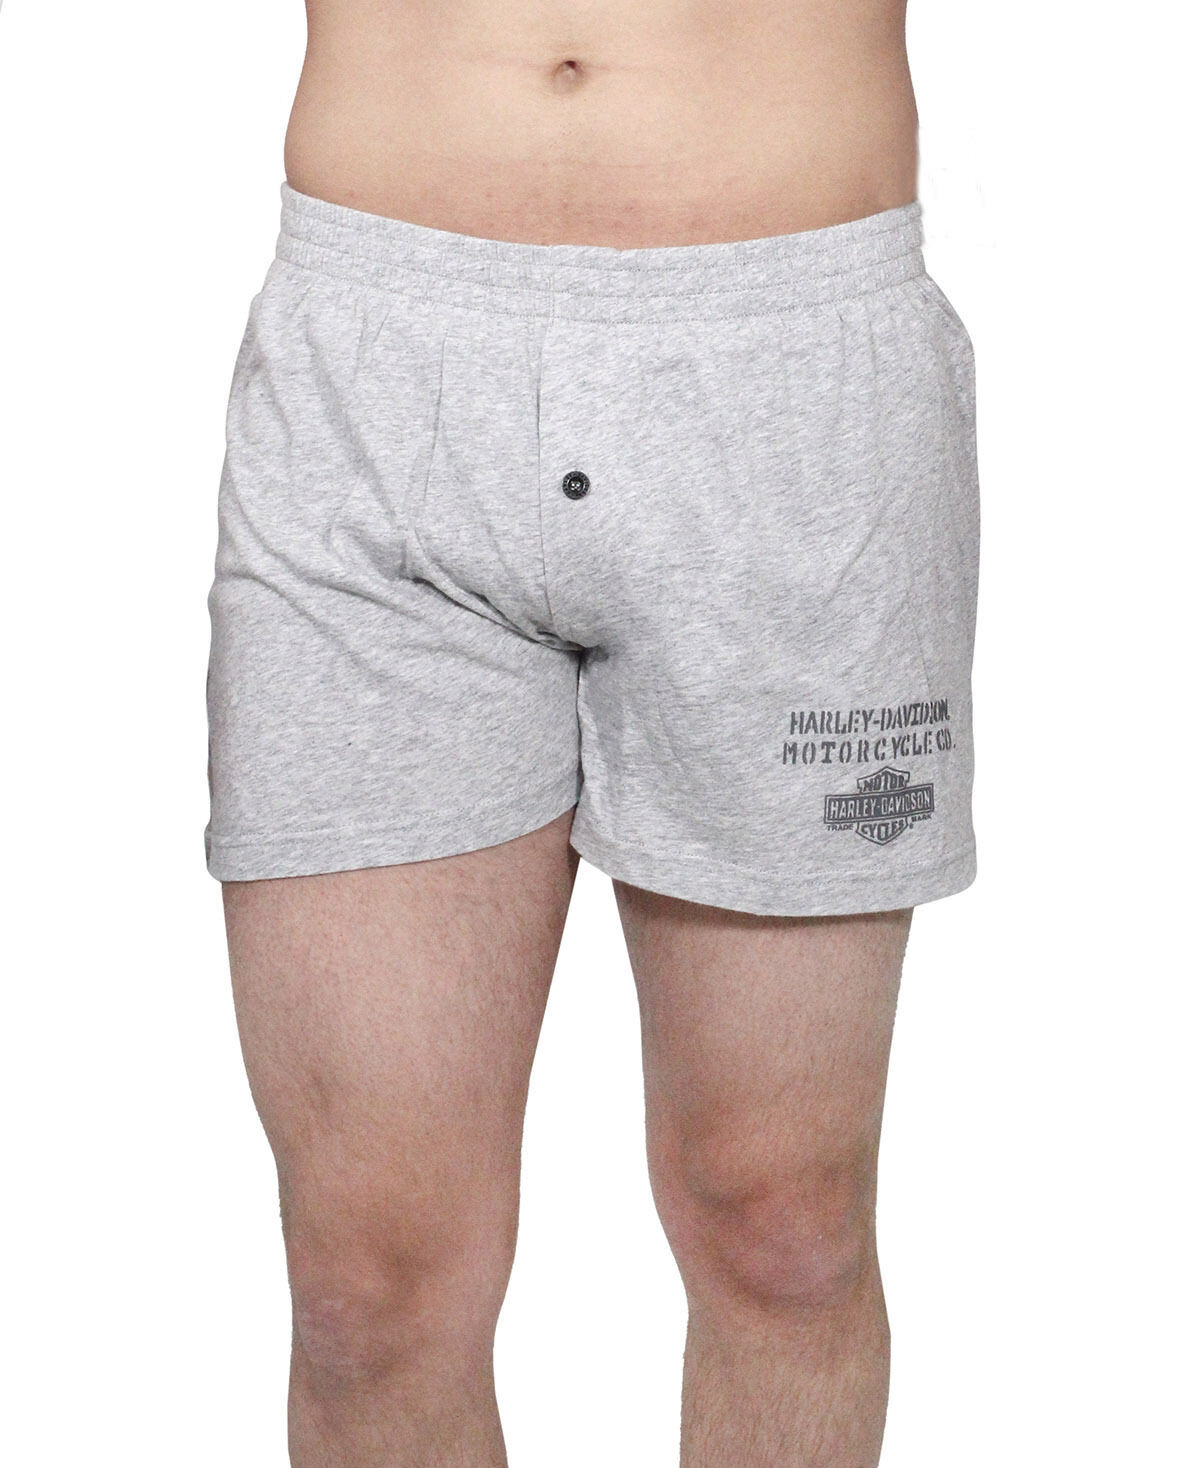 New Harley-Davidson Men Heathered Knit Grey Elastic Waist Boxer Short 97627-17VM